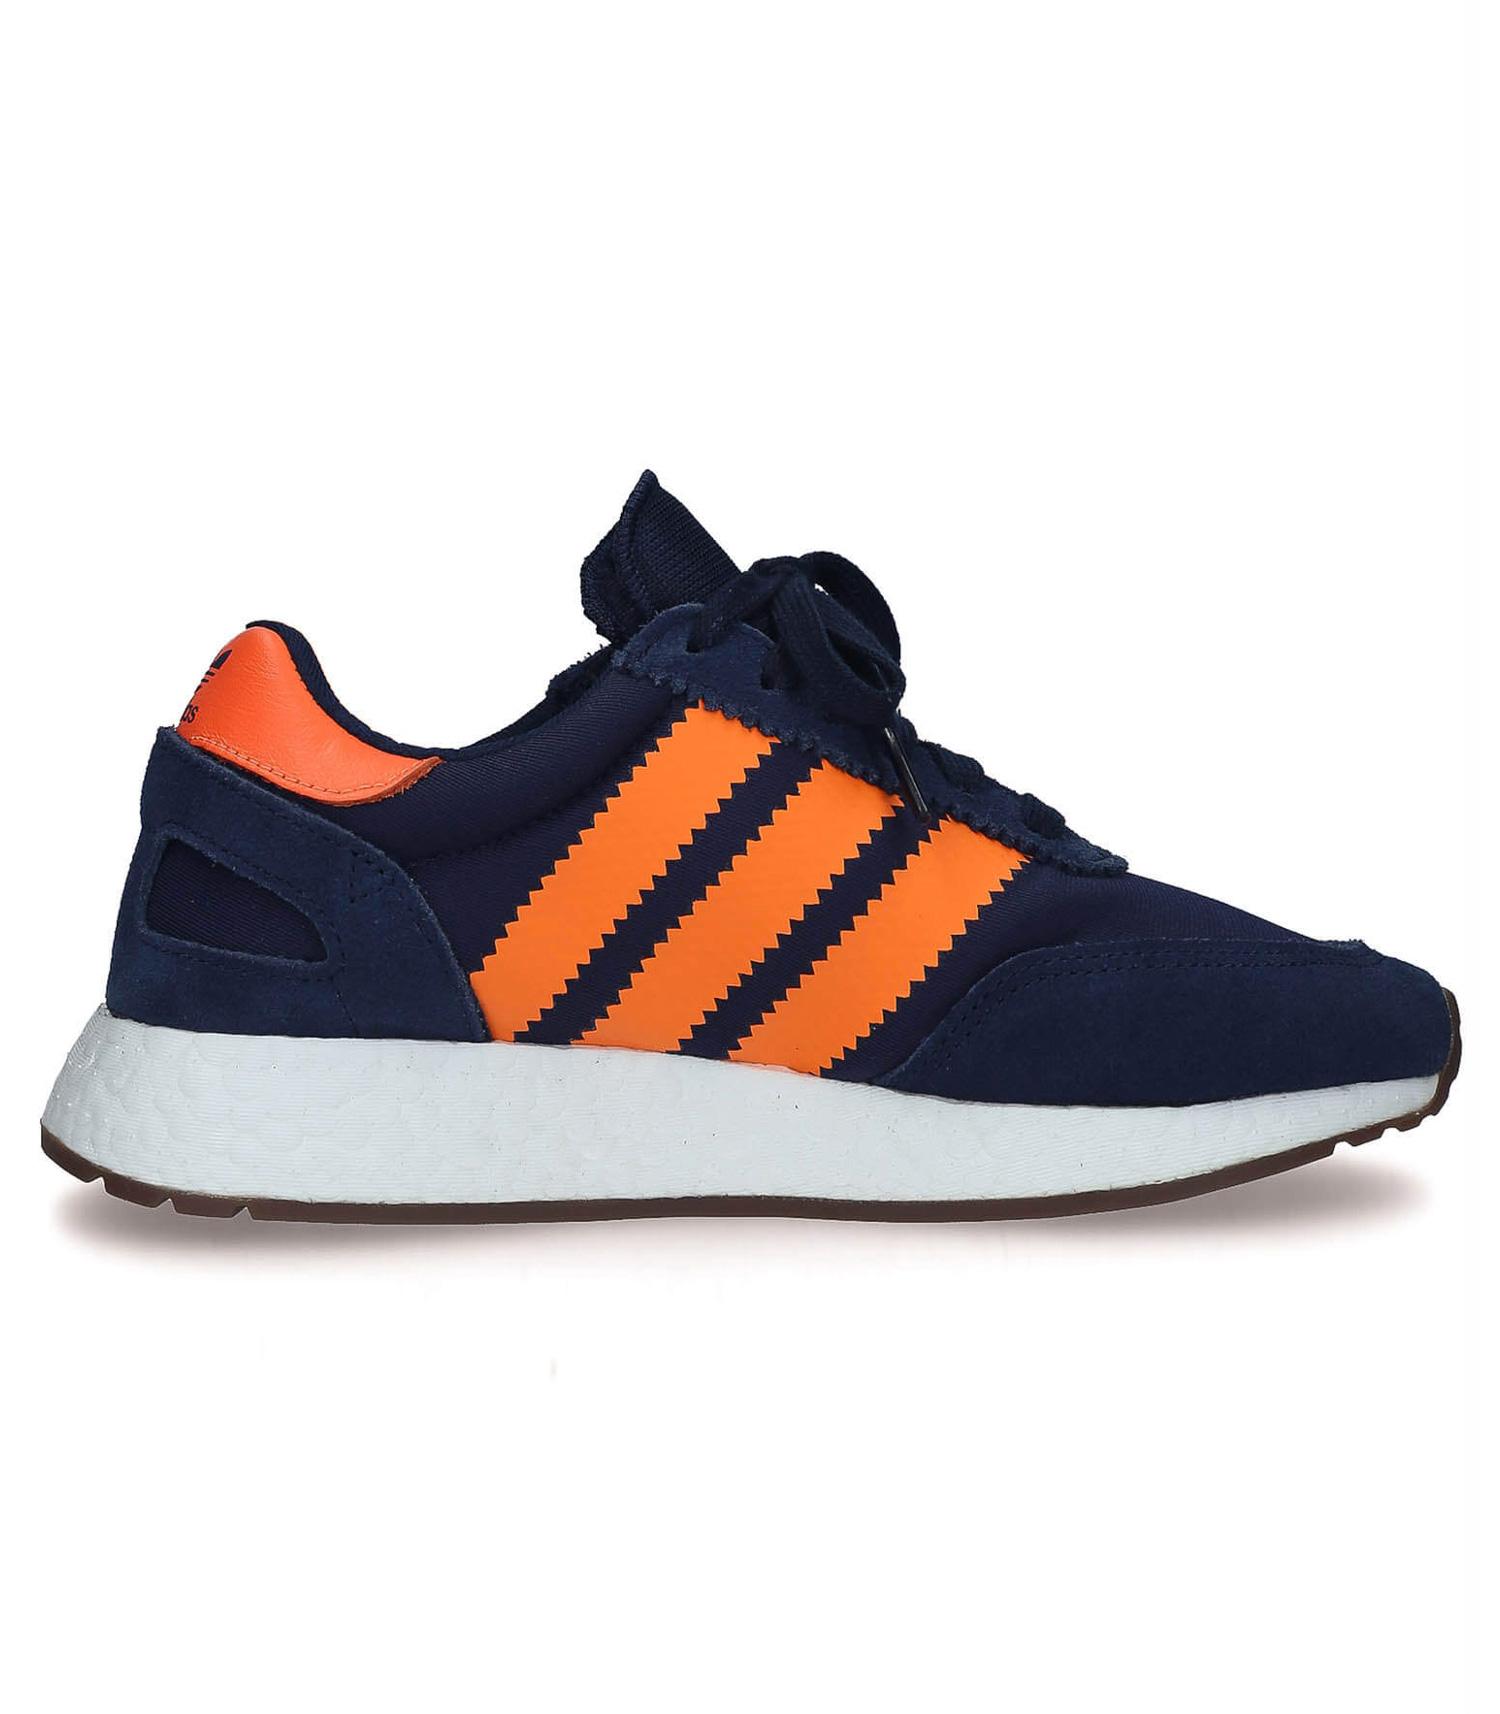 Sneakers I 5923 Bleu MarineOrange adidas Originals Jane de Boy